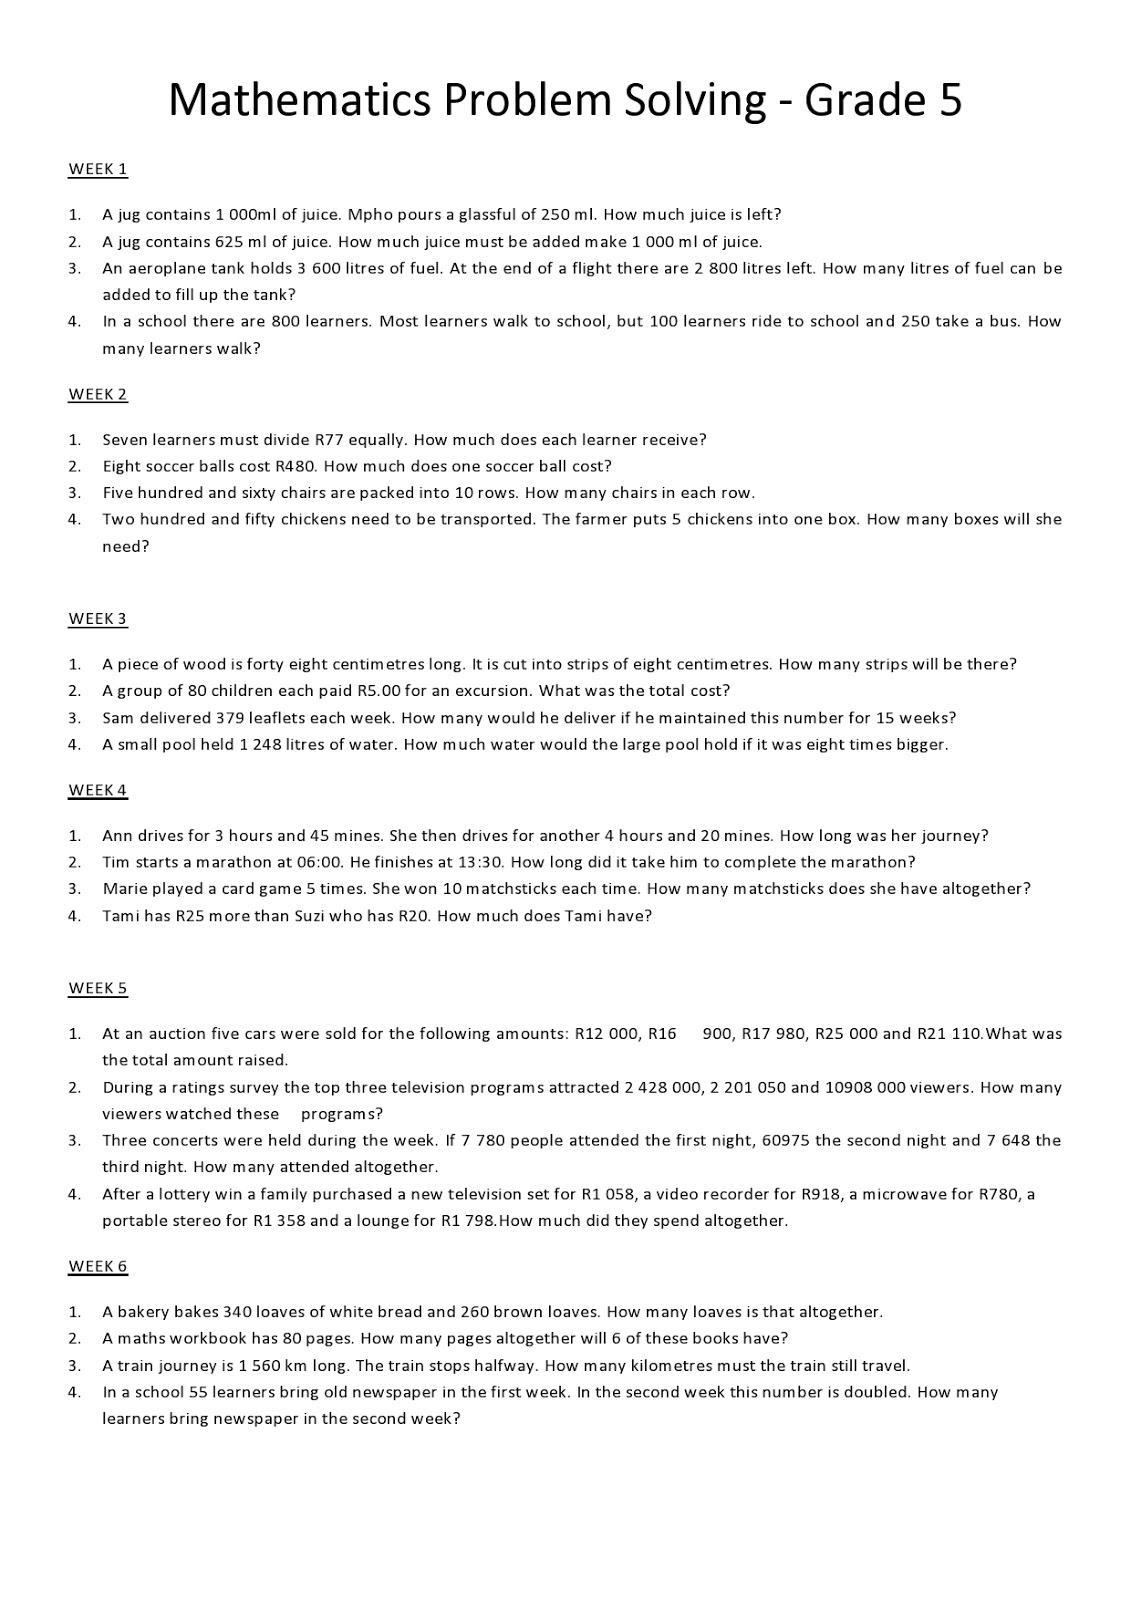 Grade 6 Math Worksheets and Problems: Logical Reasoning   Edugain Global [ 1600 x 1131 Pixel ]